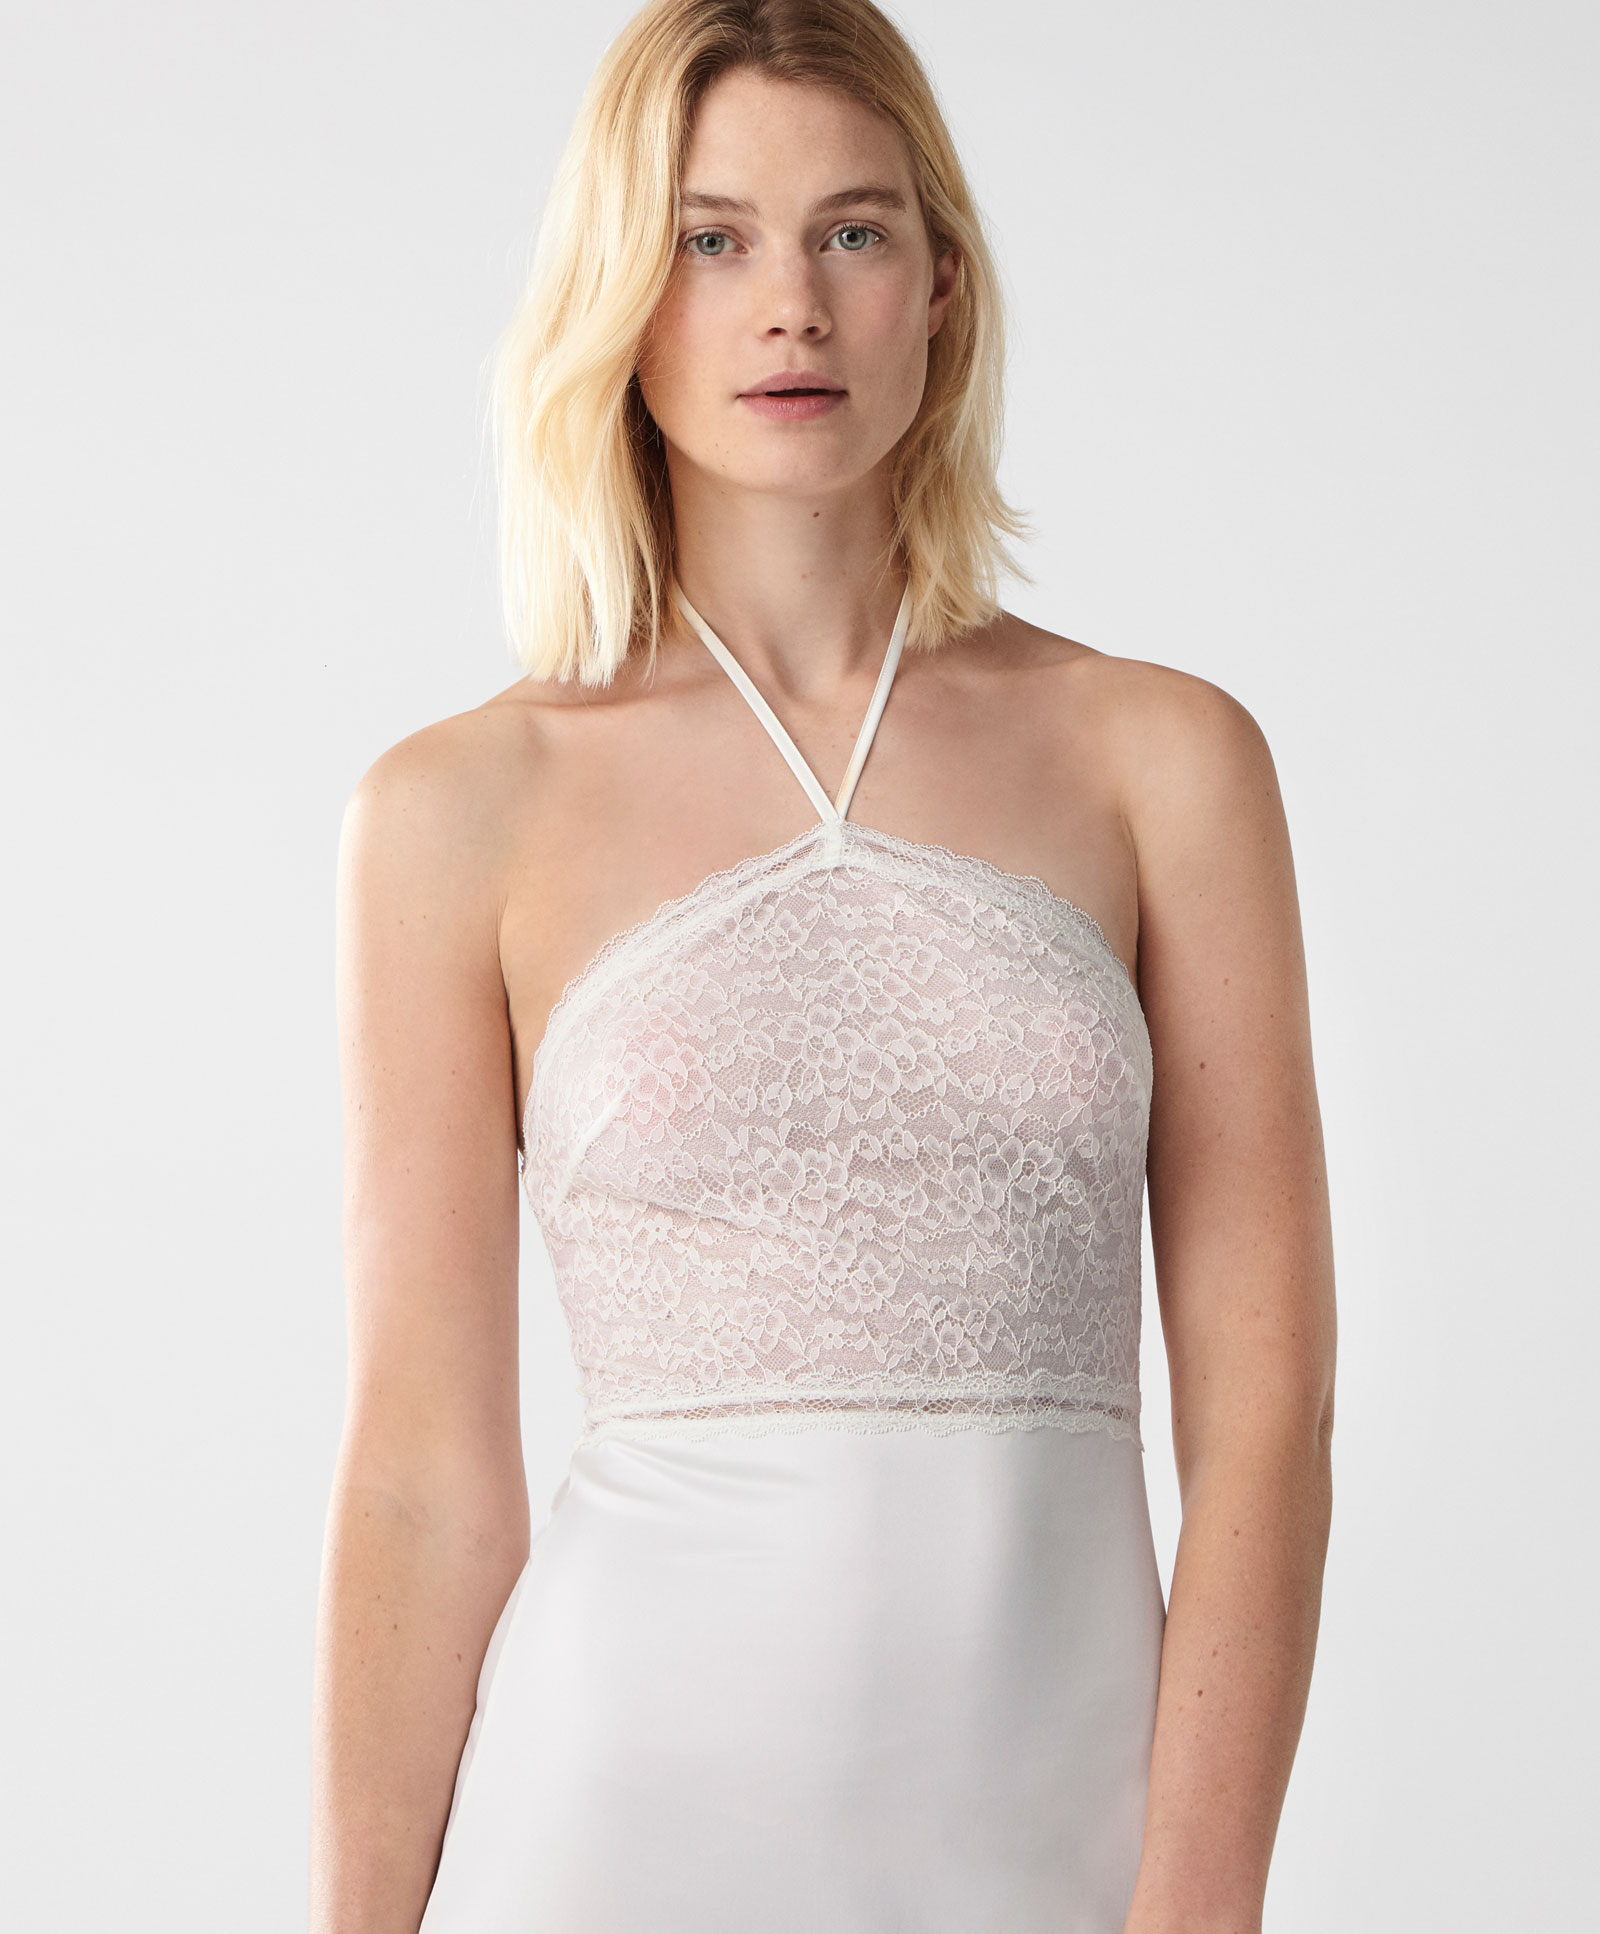 blog-mariage-parisian-inspired-lingerie1935180959_2_1_1.jpg